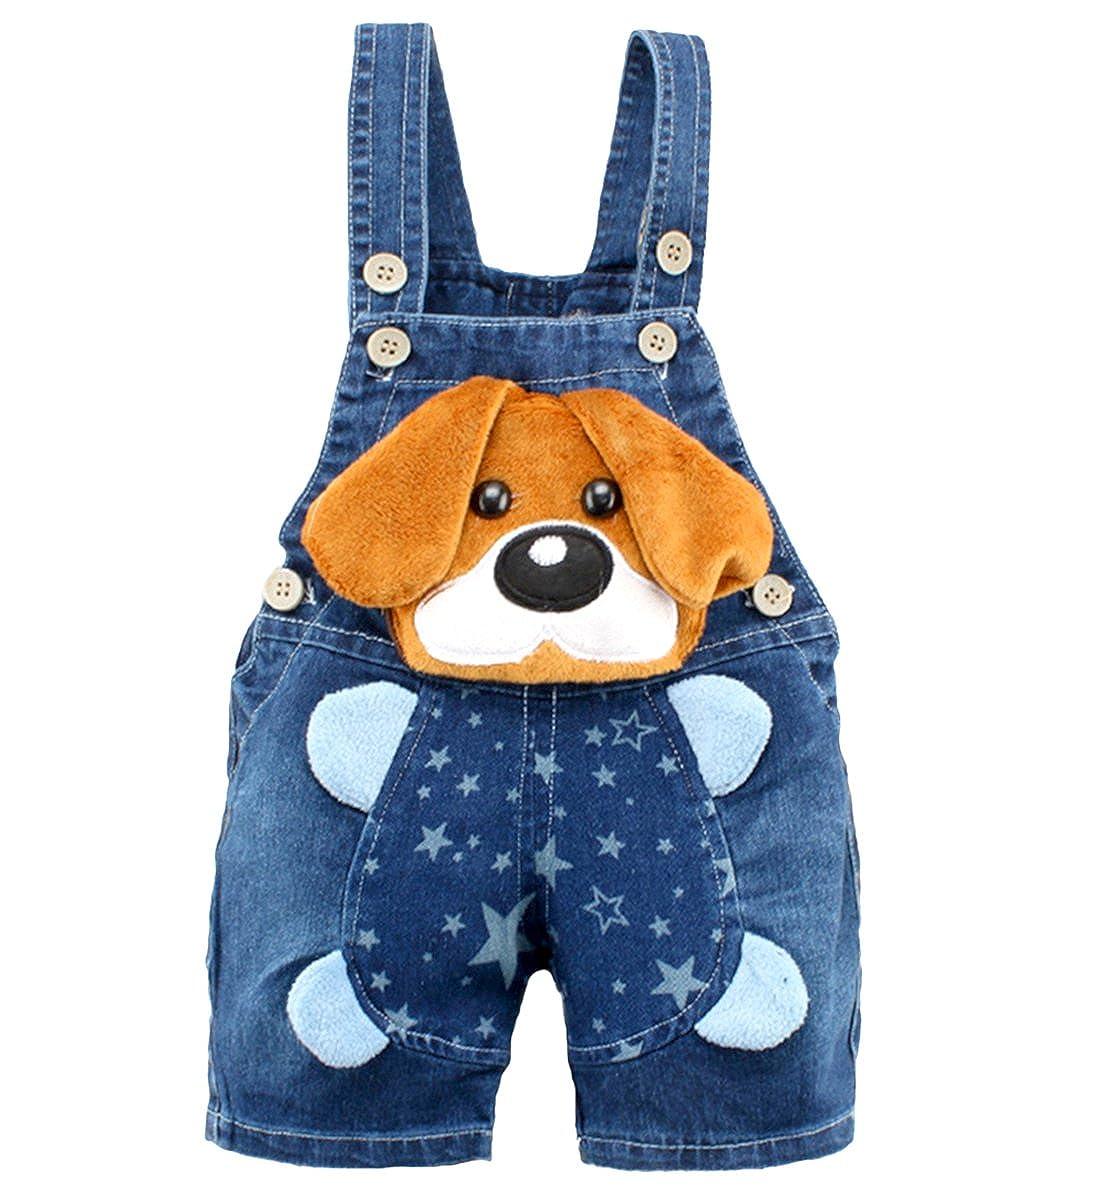 Kidscool Baby Boys/Girls Big Yellow Ears Cute Dog Summer Jeans Shortalls